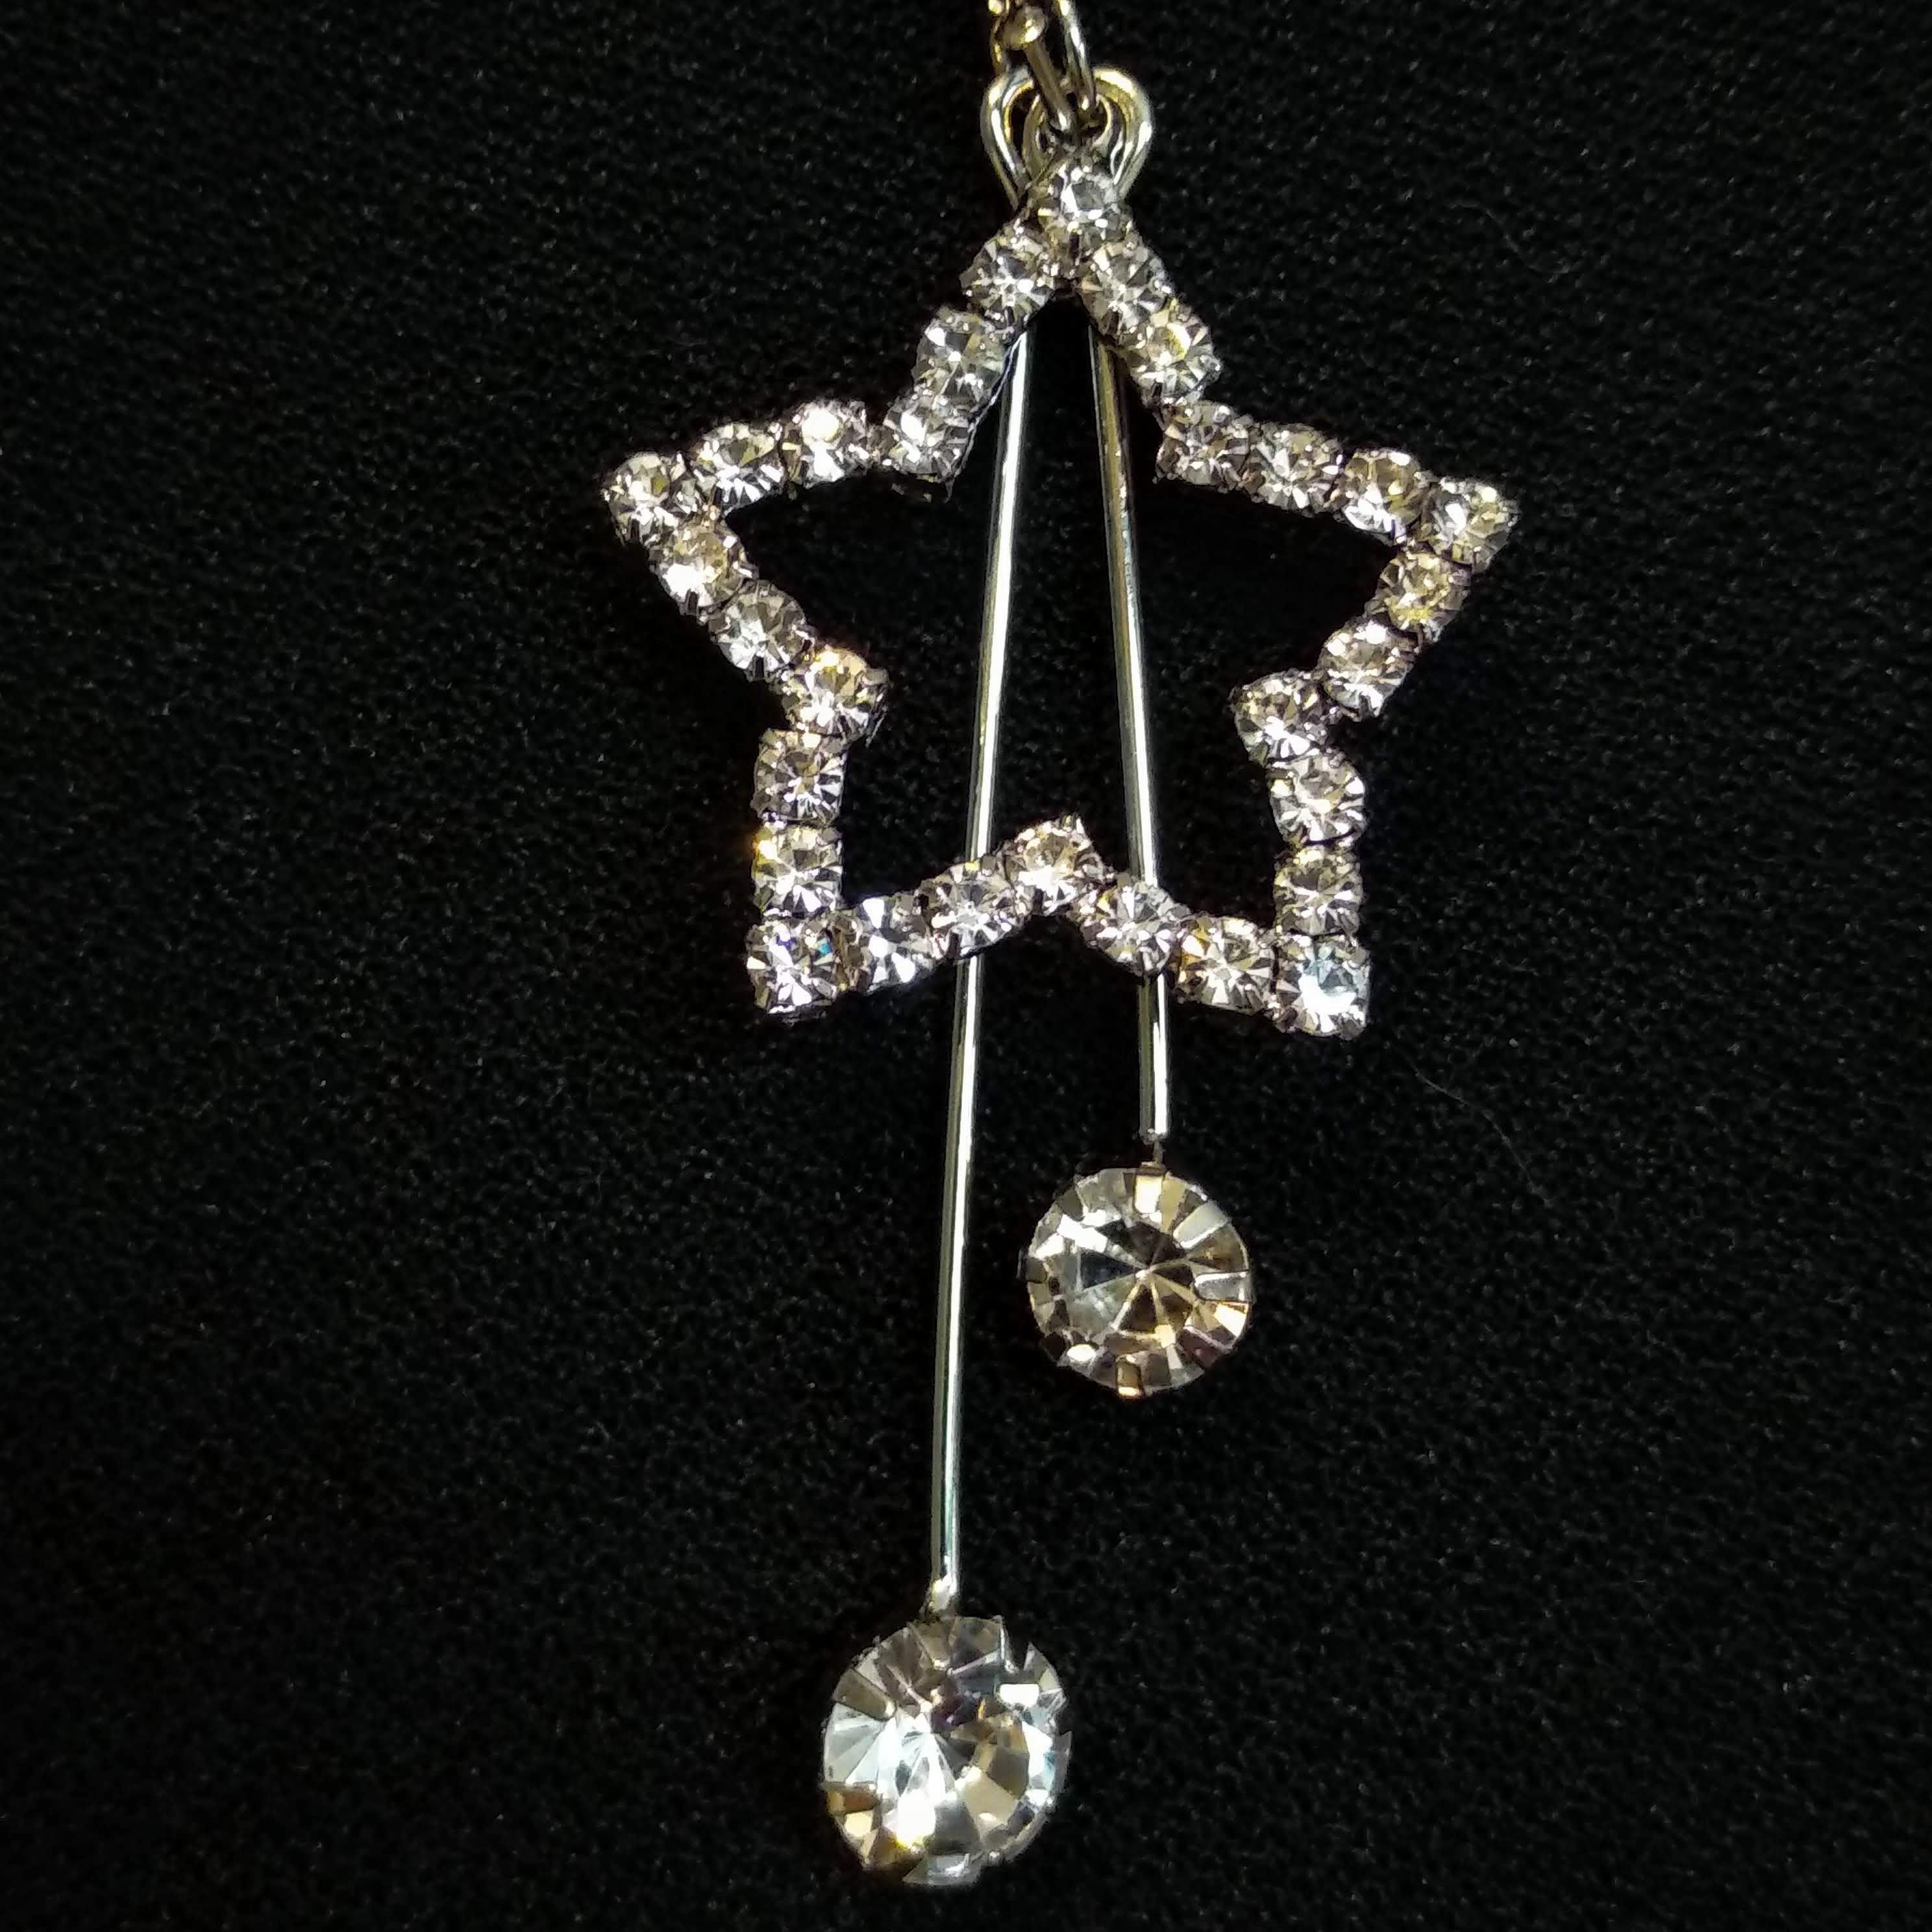 ZQMM Элегантная звезда - висячие серьги с цирконием для женщин от магазина ZQMM Store.